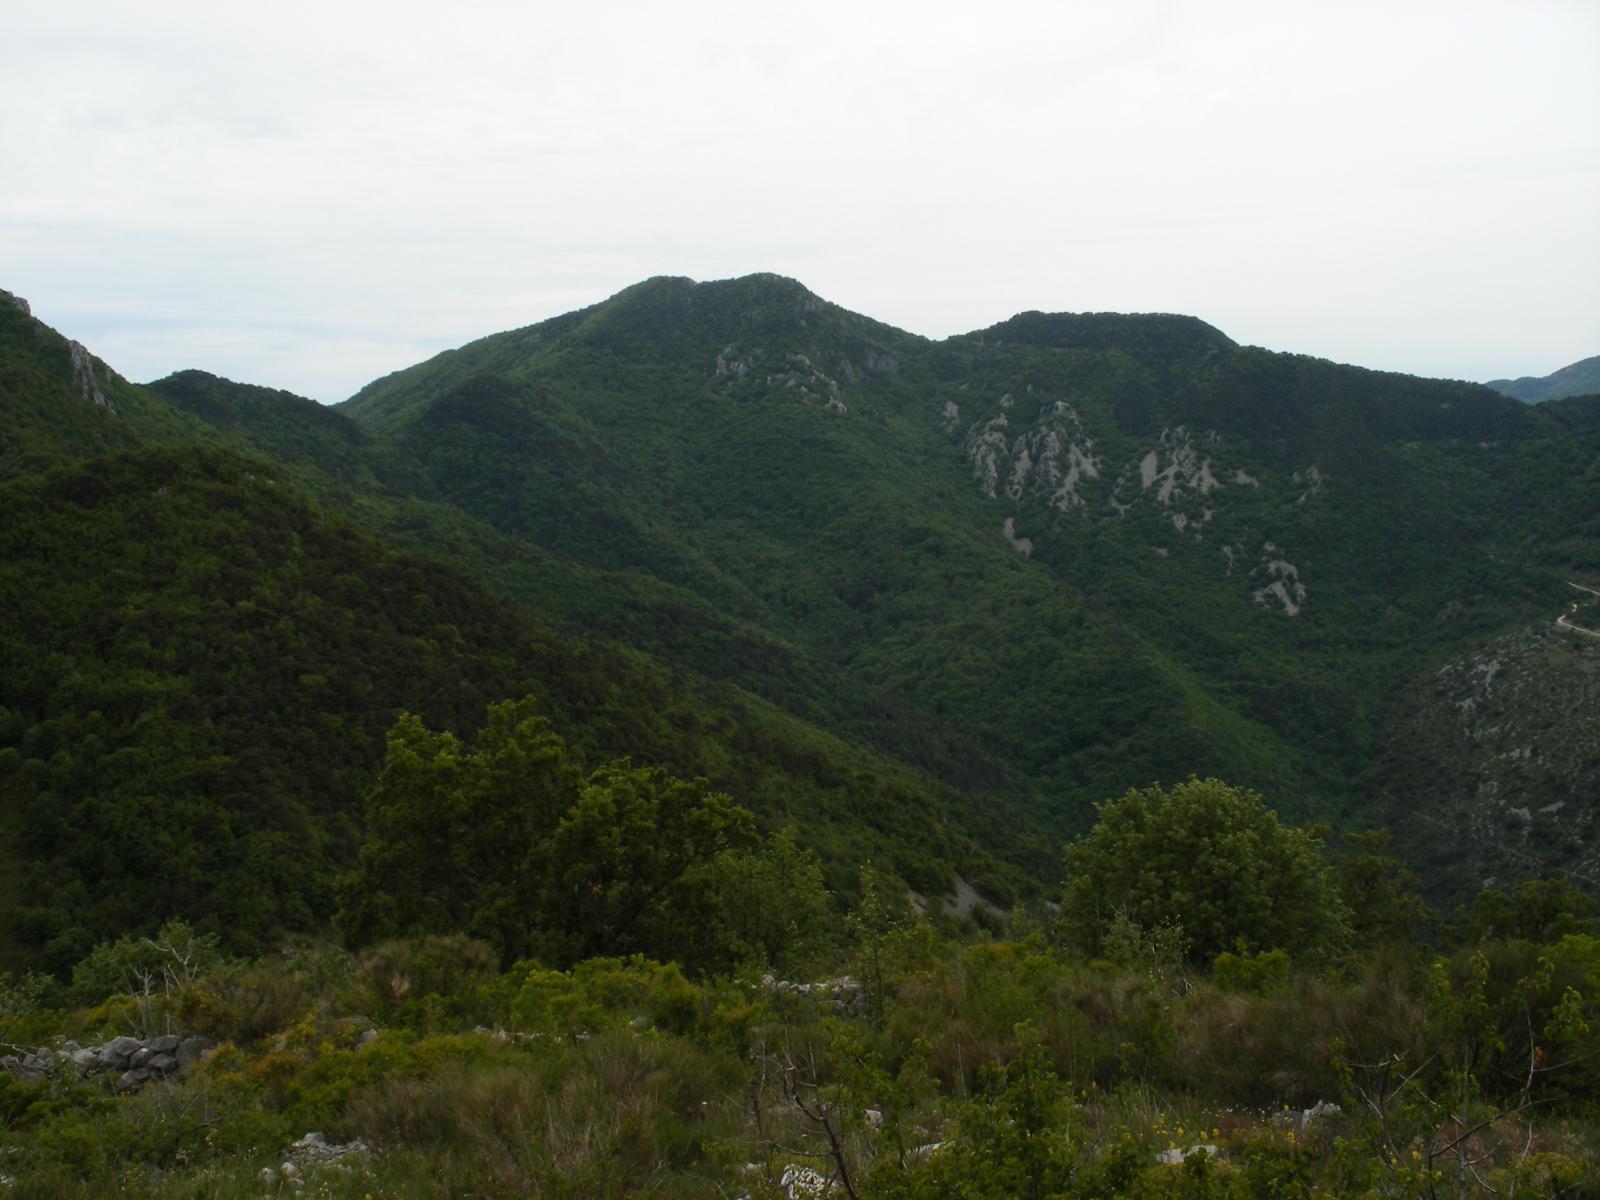 Razet (Mont)da Sospel, anello Col du Razet, Baisse de Scuvion, Col de Roulabre e ka Cuore 2014-05-25